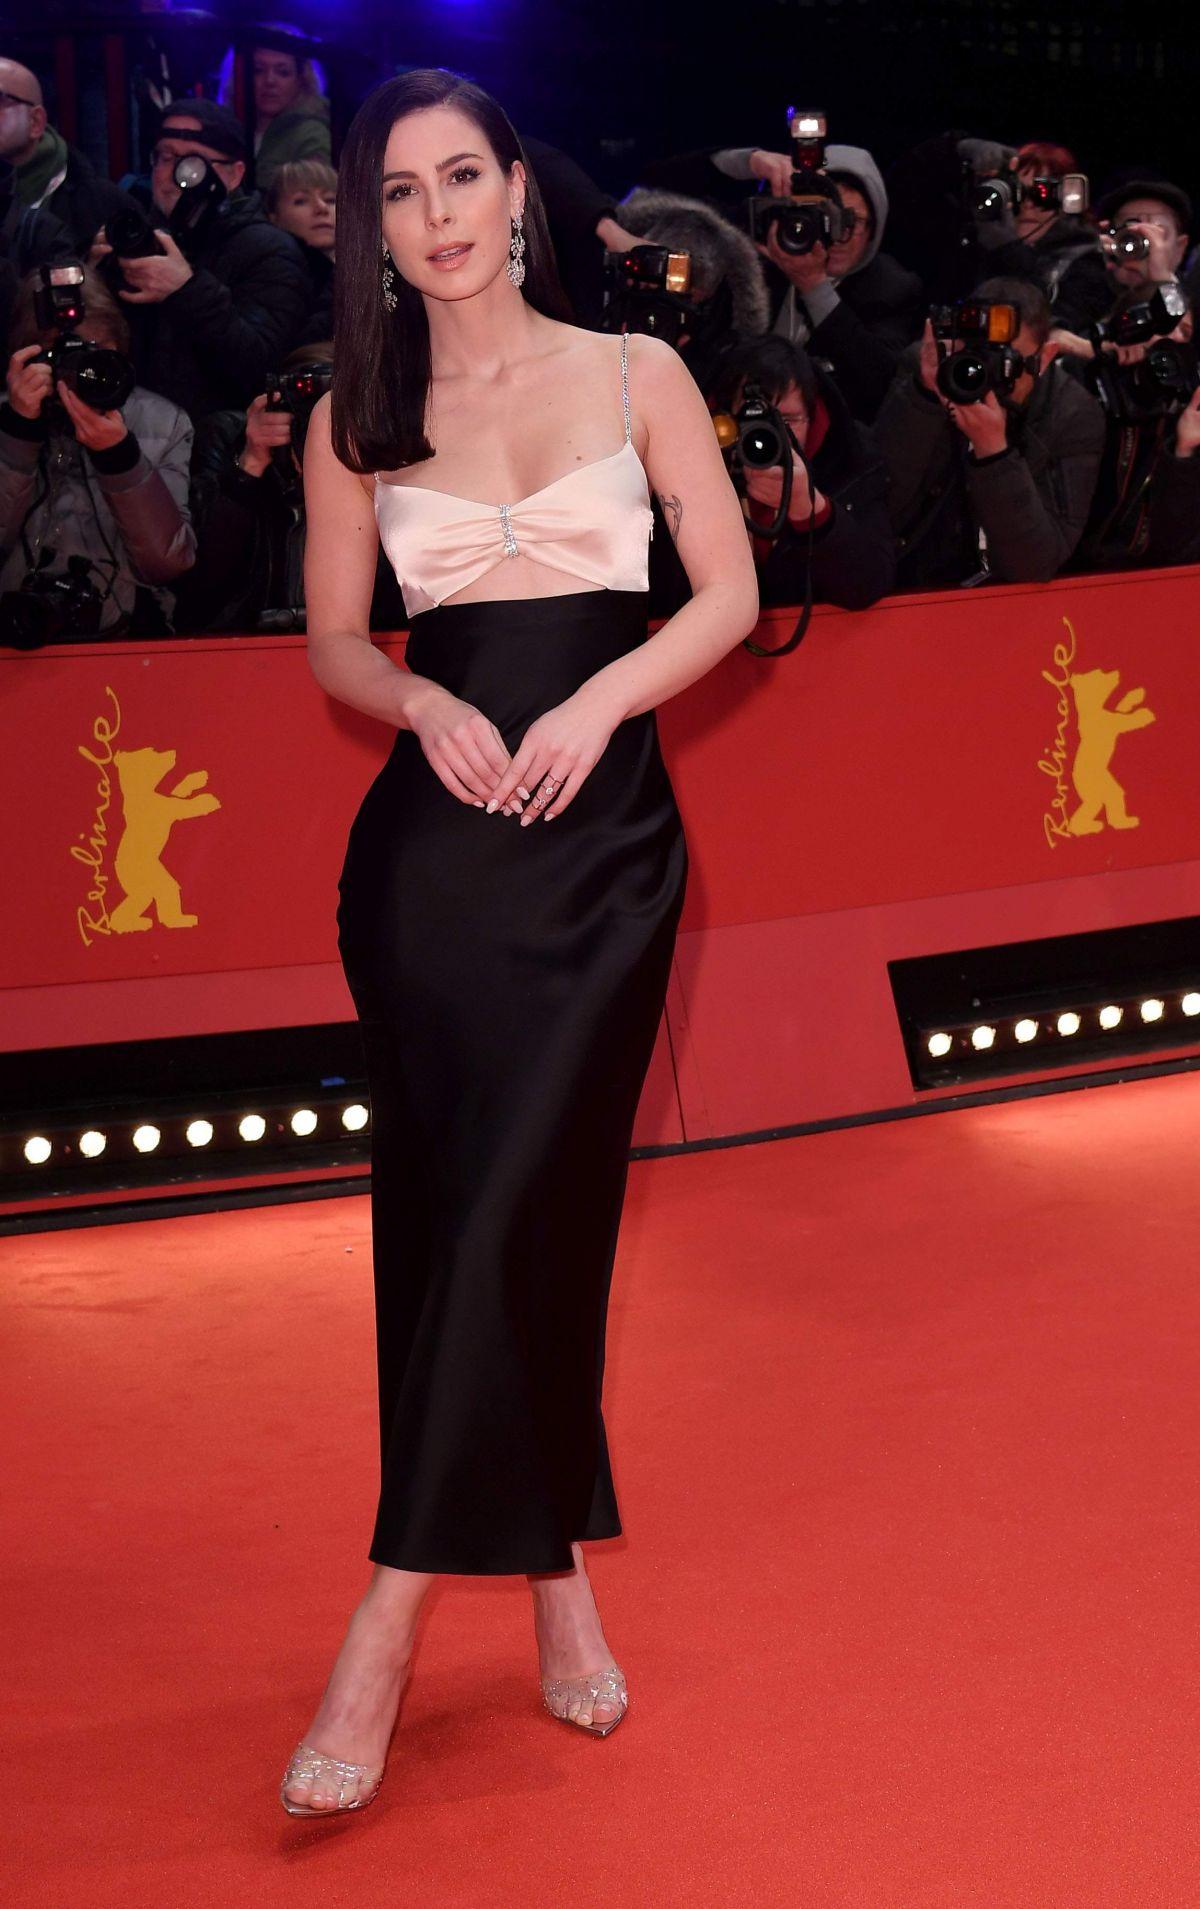 LENA MEYER-LANDRUT at Berlinale Opening Ceremony 02/20 ...